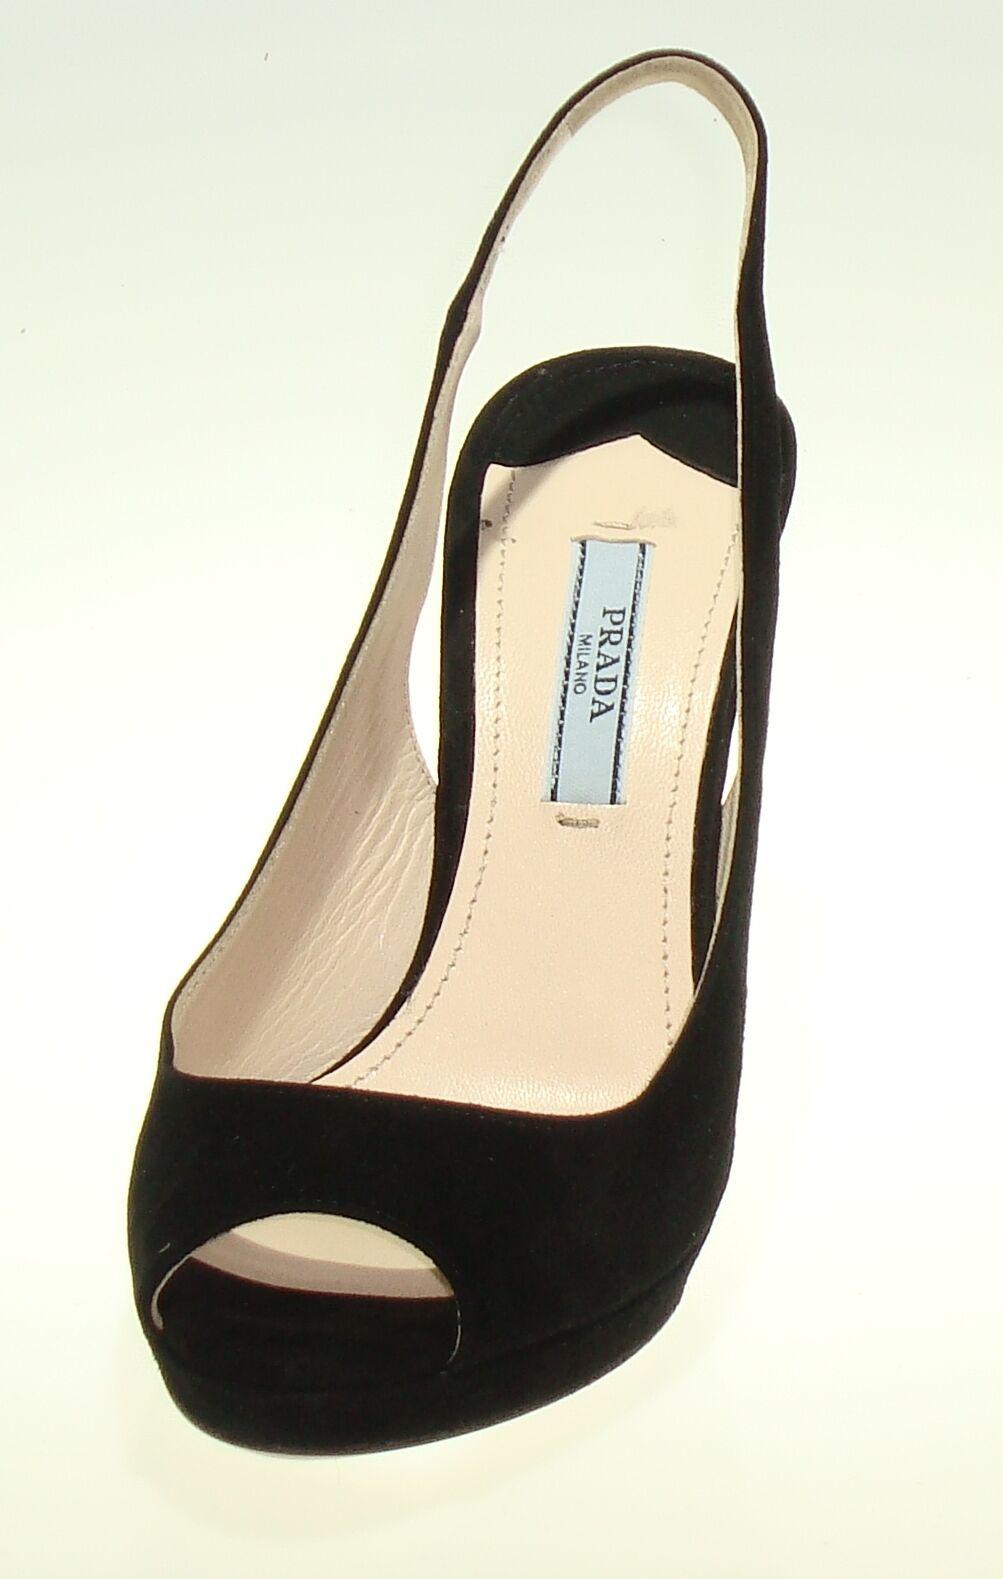 Pour Femmes Auth 100 Escarpin Prada Chaussures vqOSCC